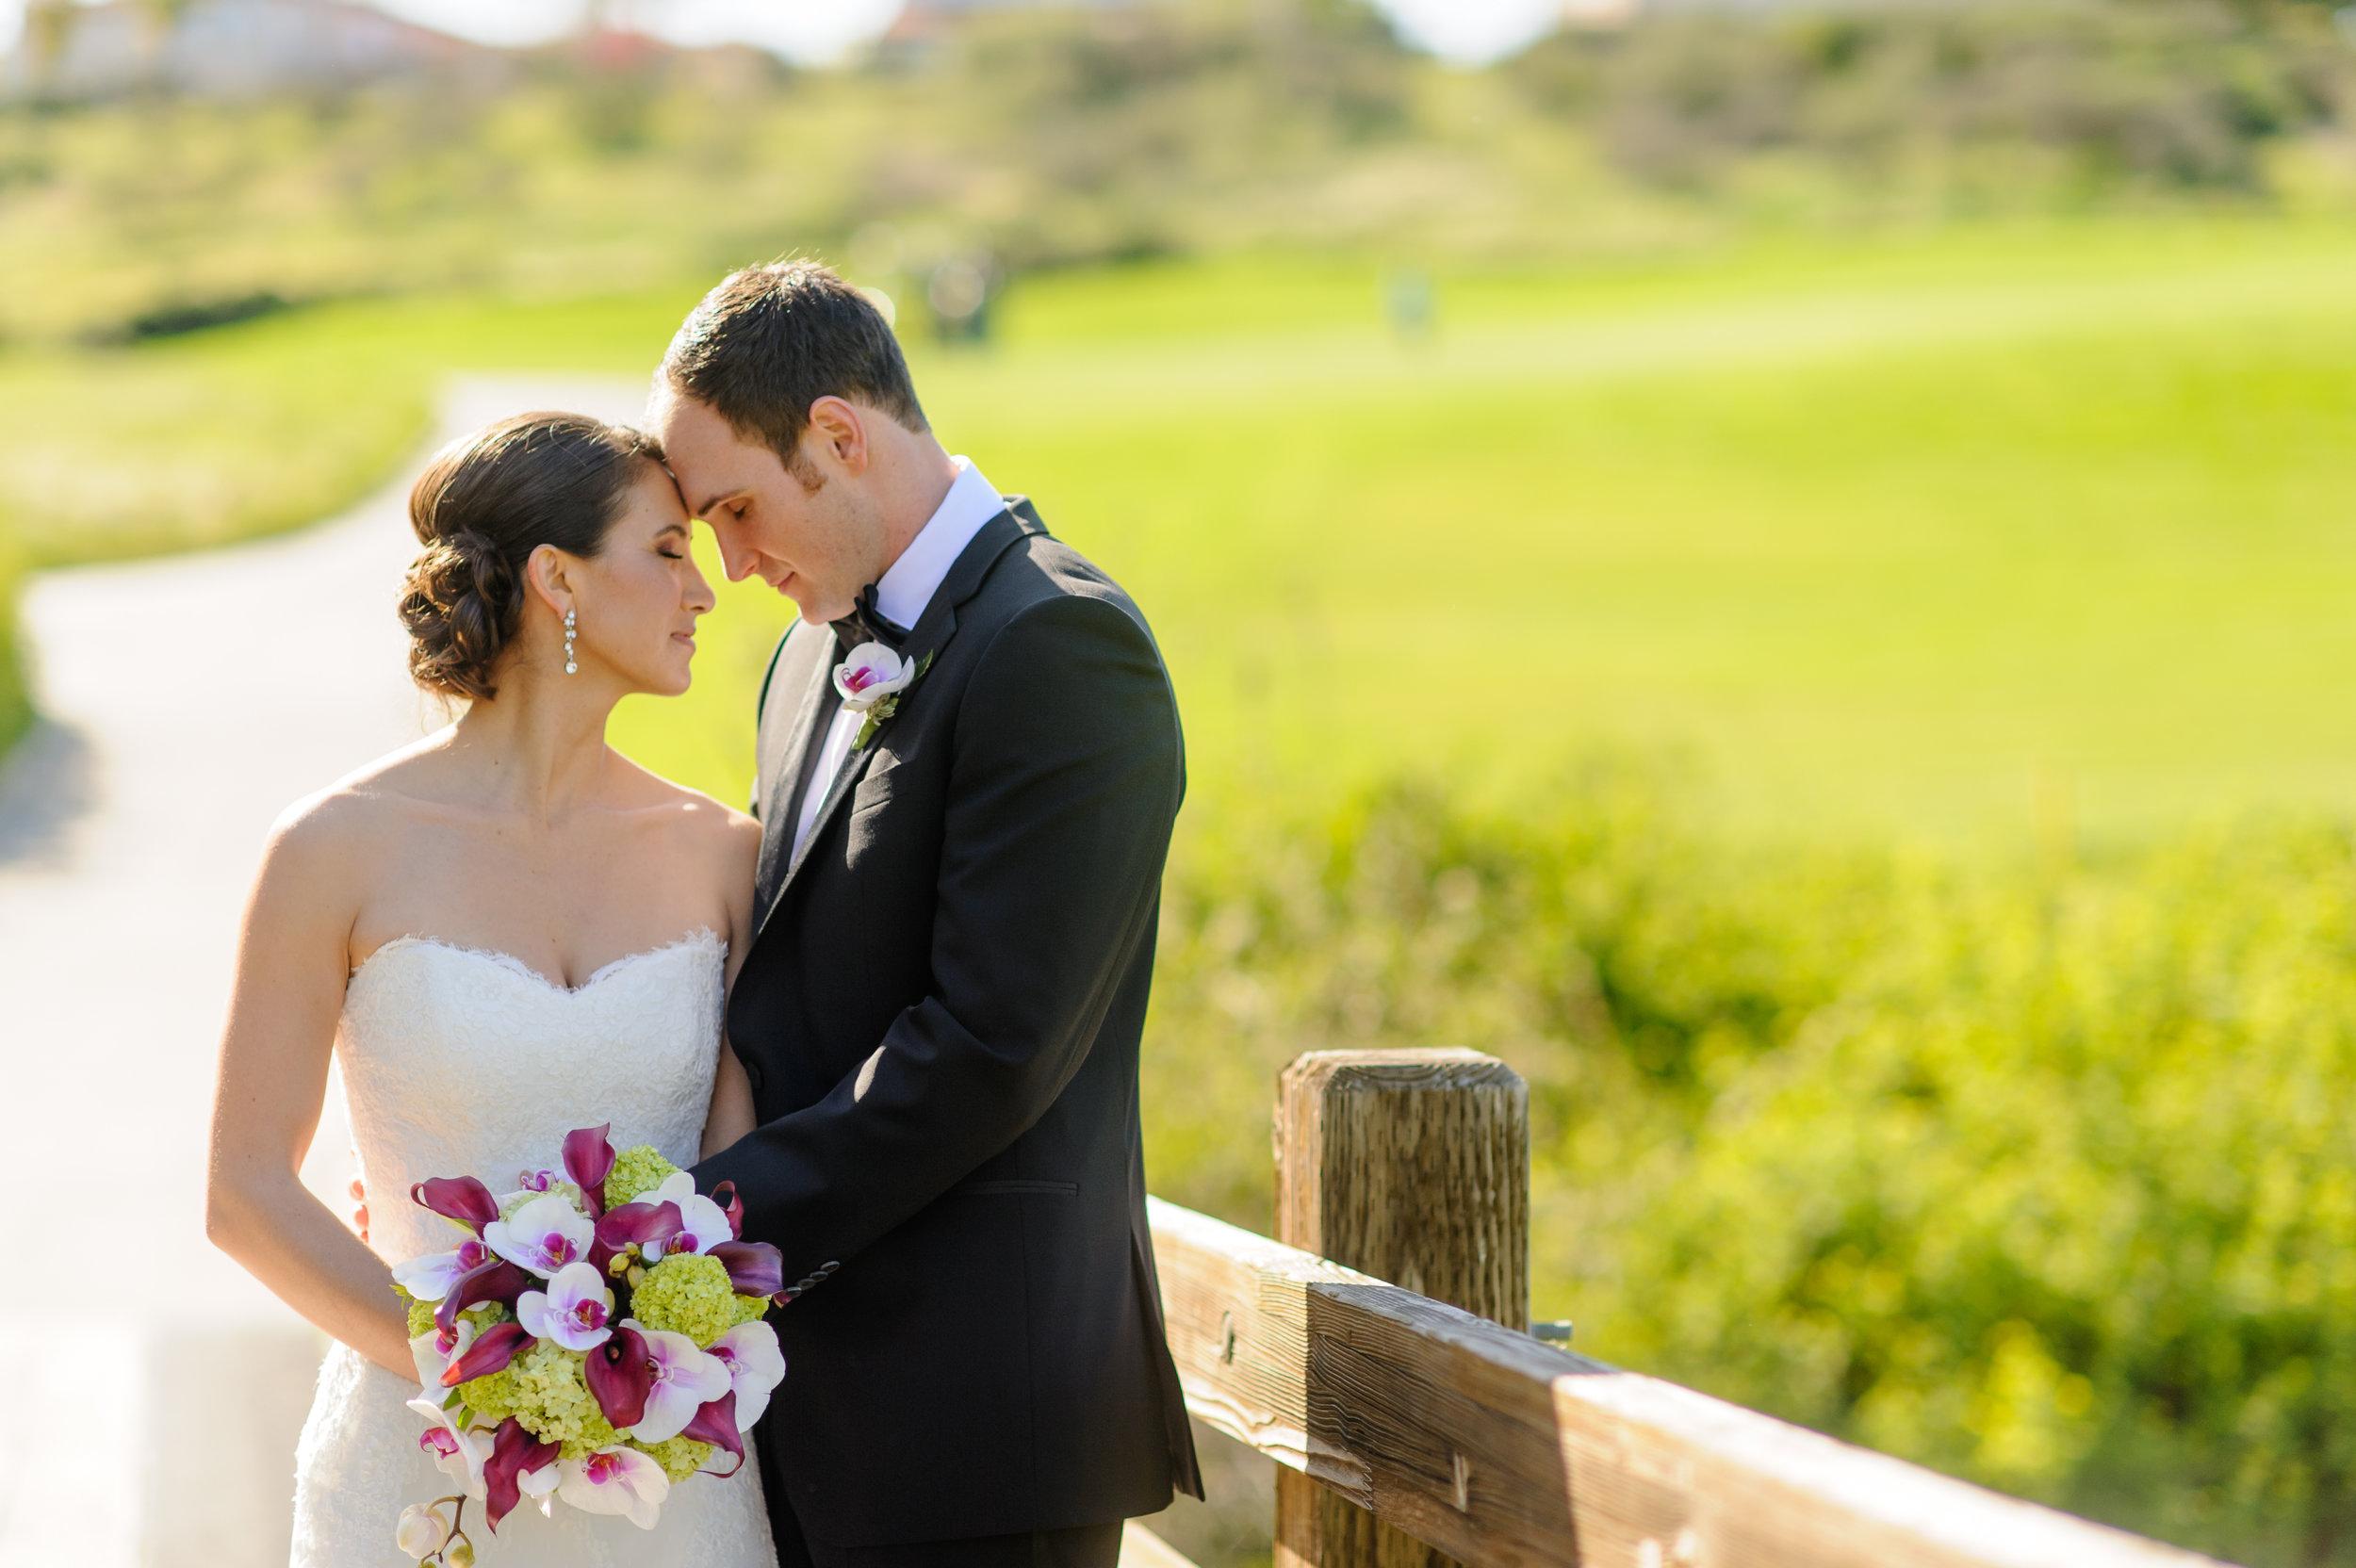 lindsey-jake-014-the-bridges-golf-course-san-ramon-wedding-photographer-katherine-nicole-photography.JPG